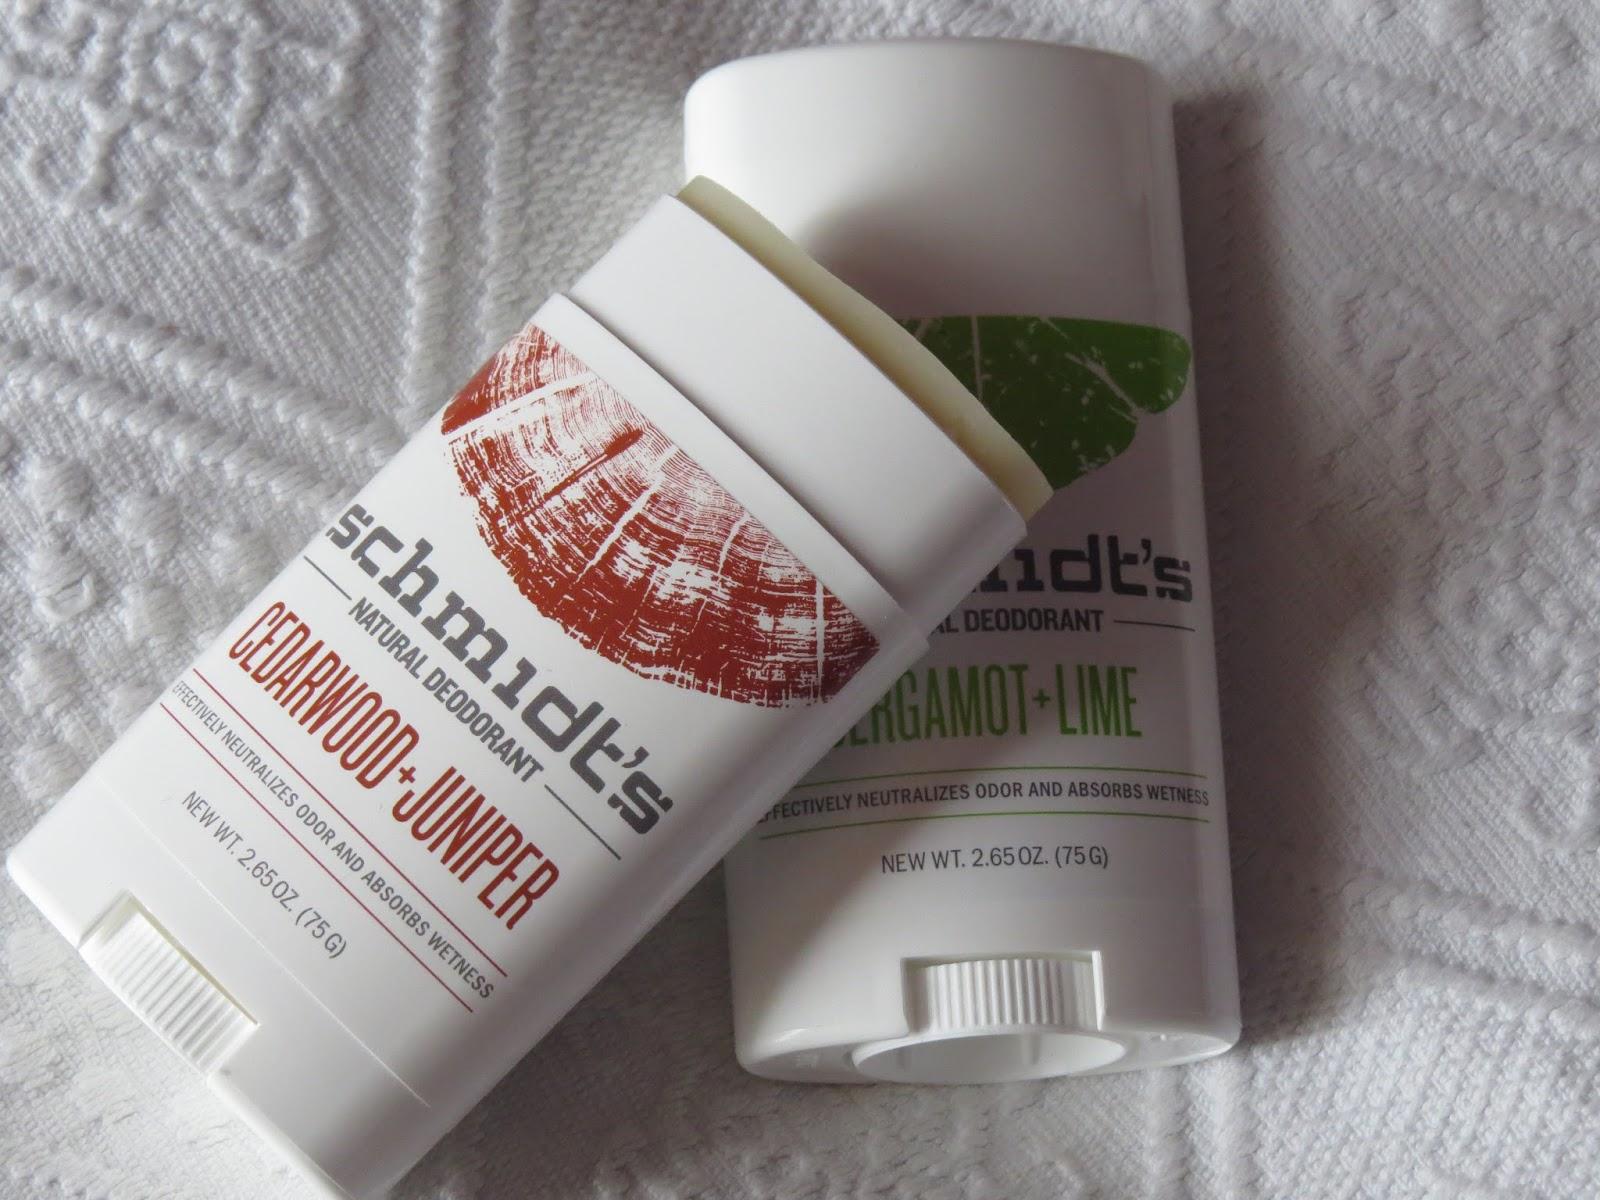 beauty balm schmidt 39 s natural deodorant stick review giveaway it 39 s over. Black Bedroom Furniture Sets. Home Design Ideas